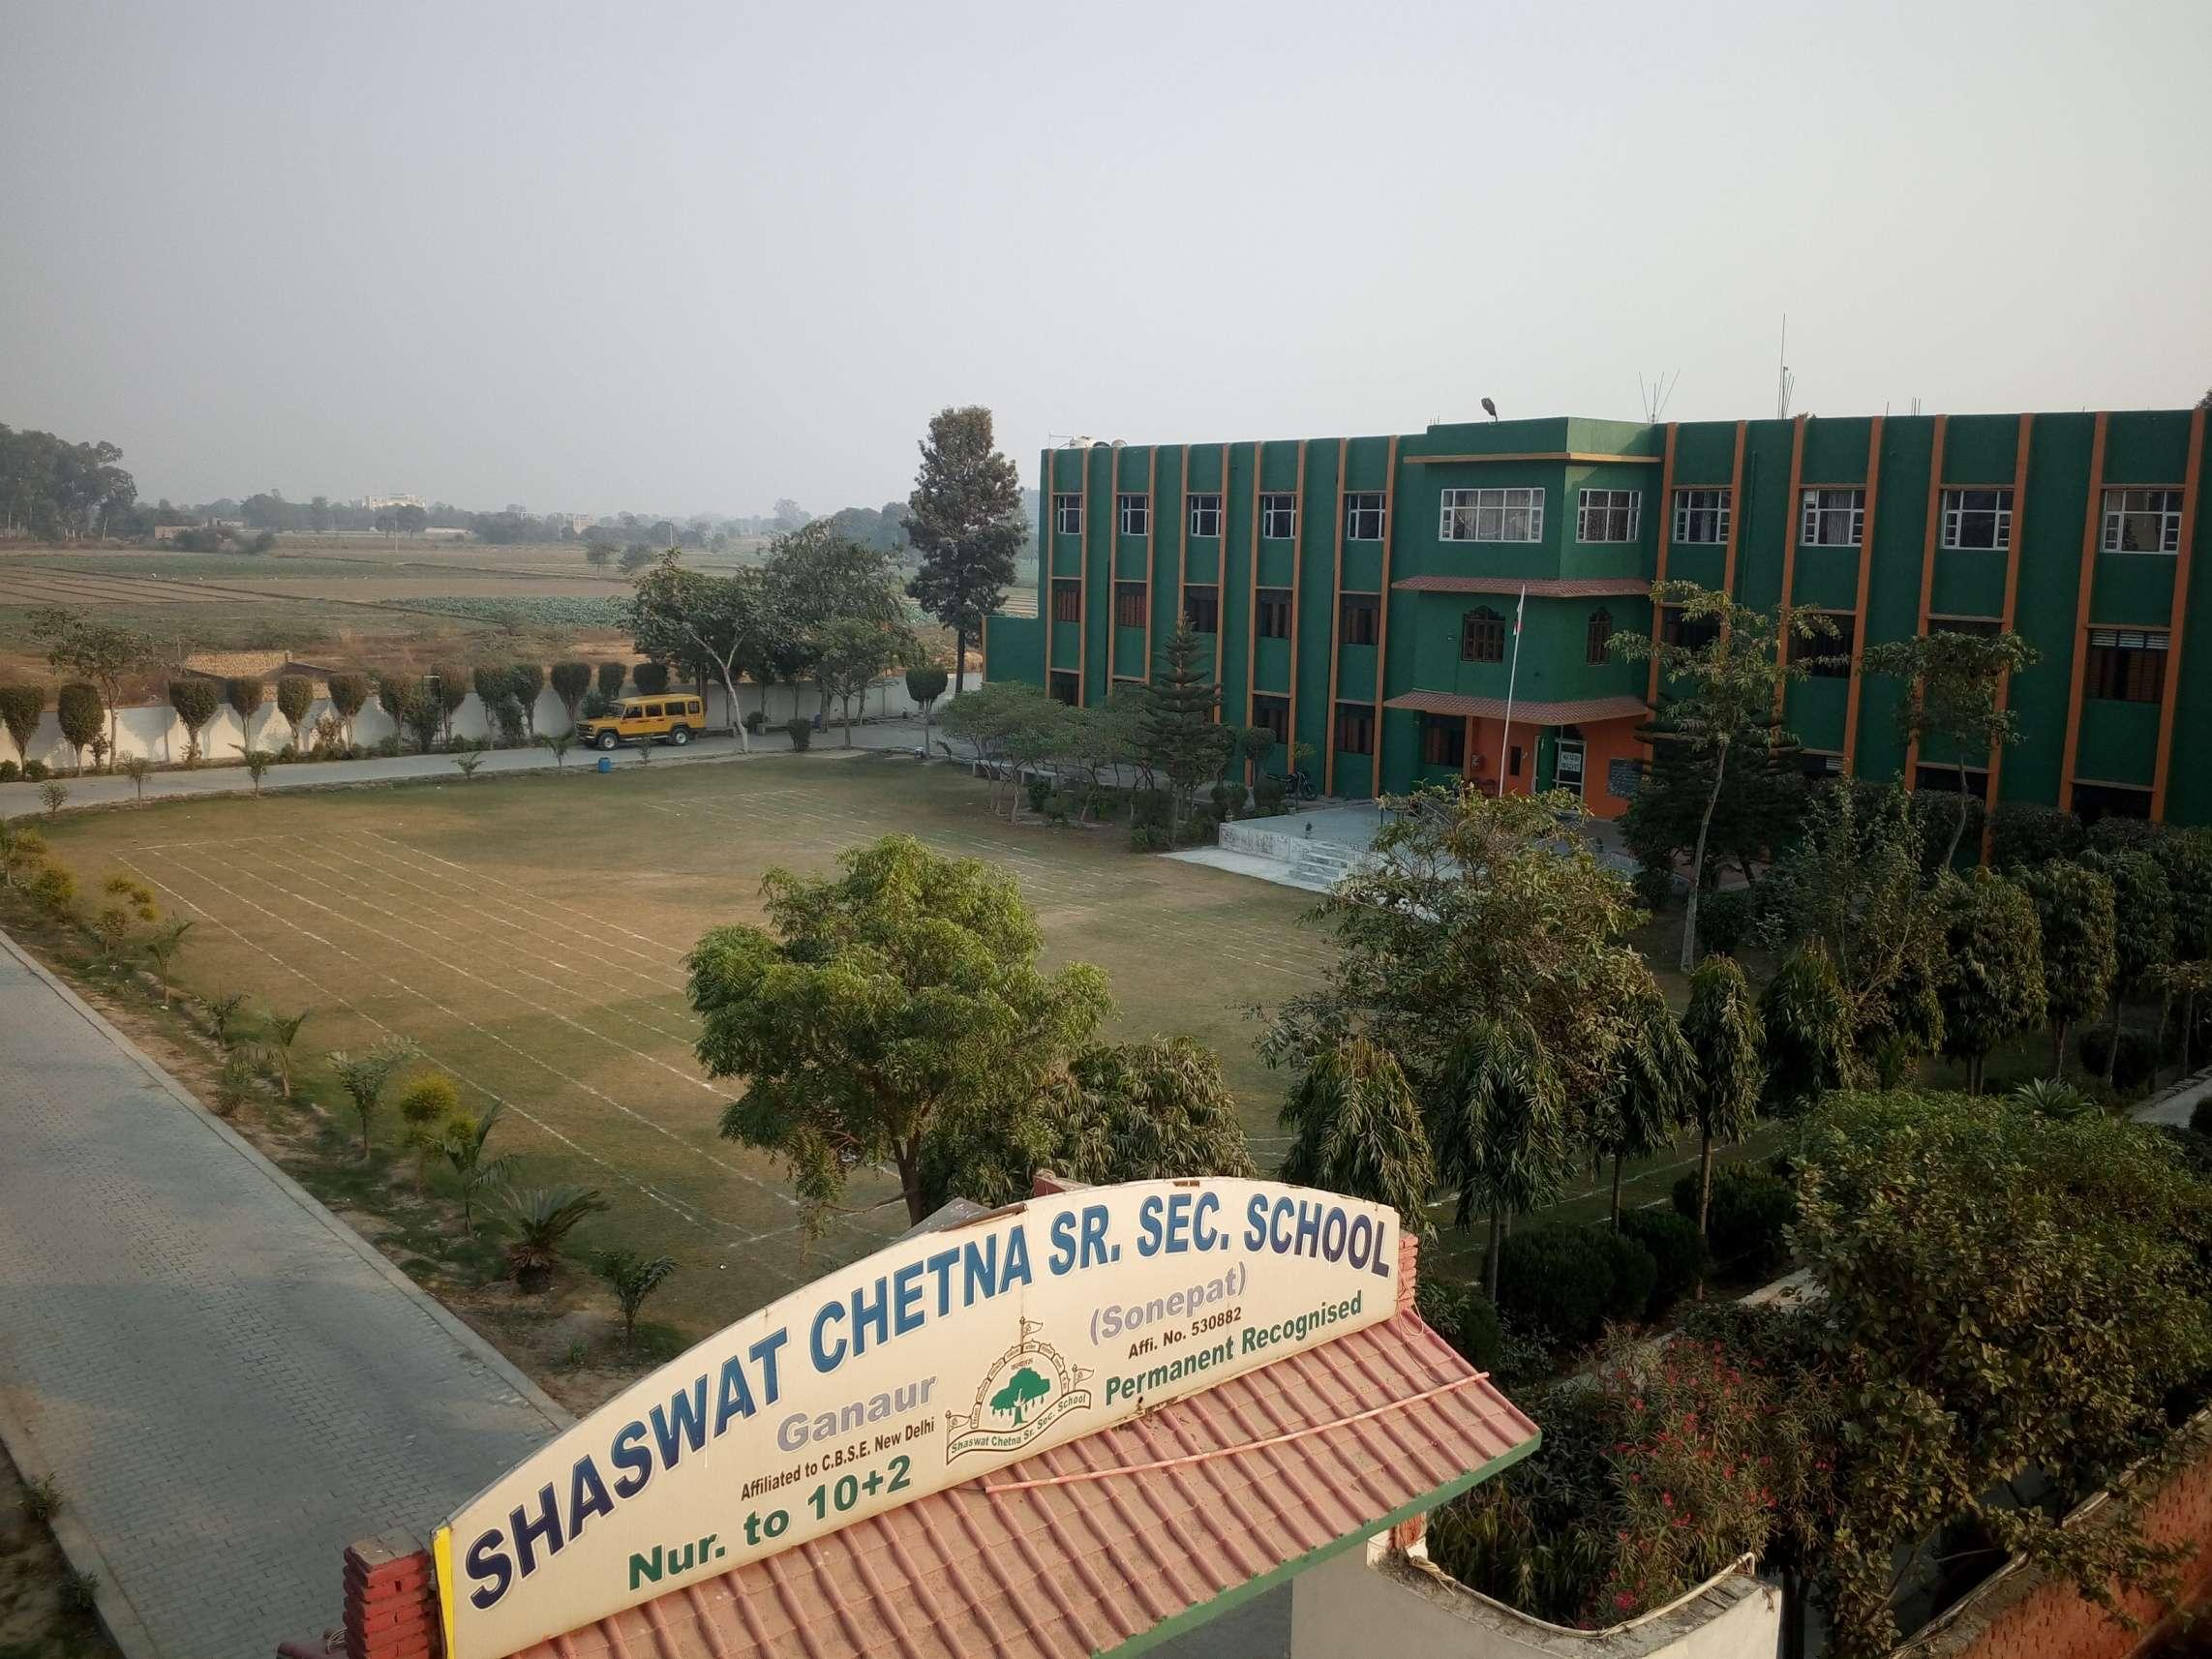 shaswat chetna sr sec school shaswat chetna sr sec school ganaur 530882